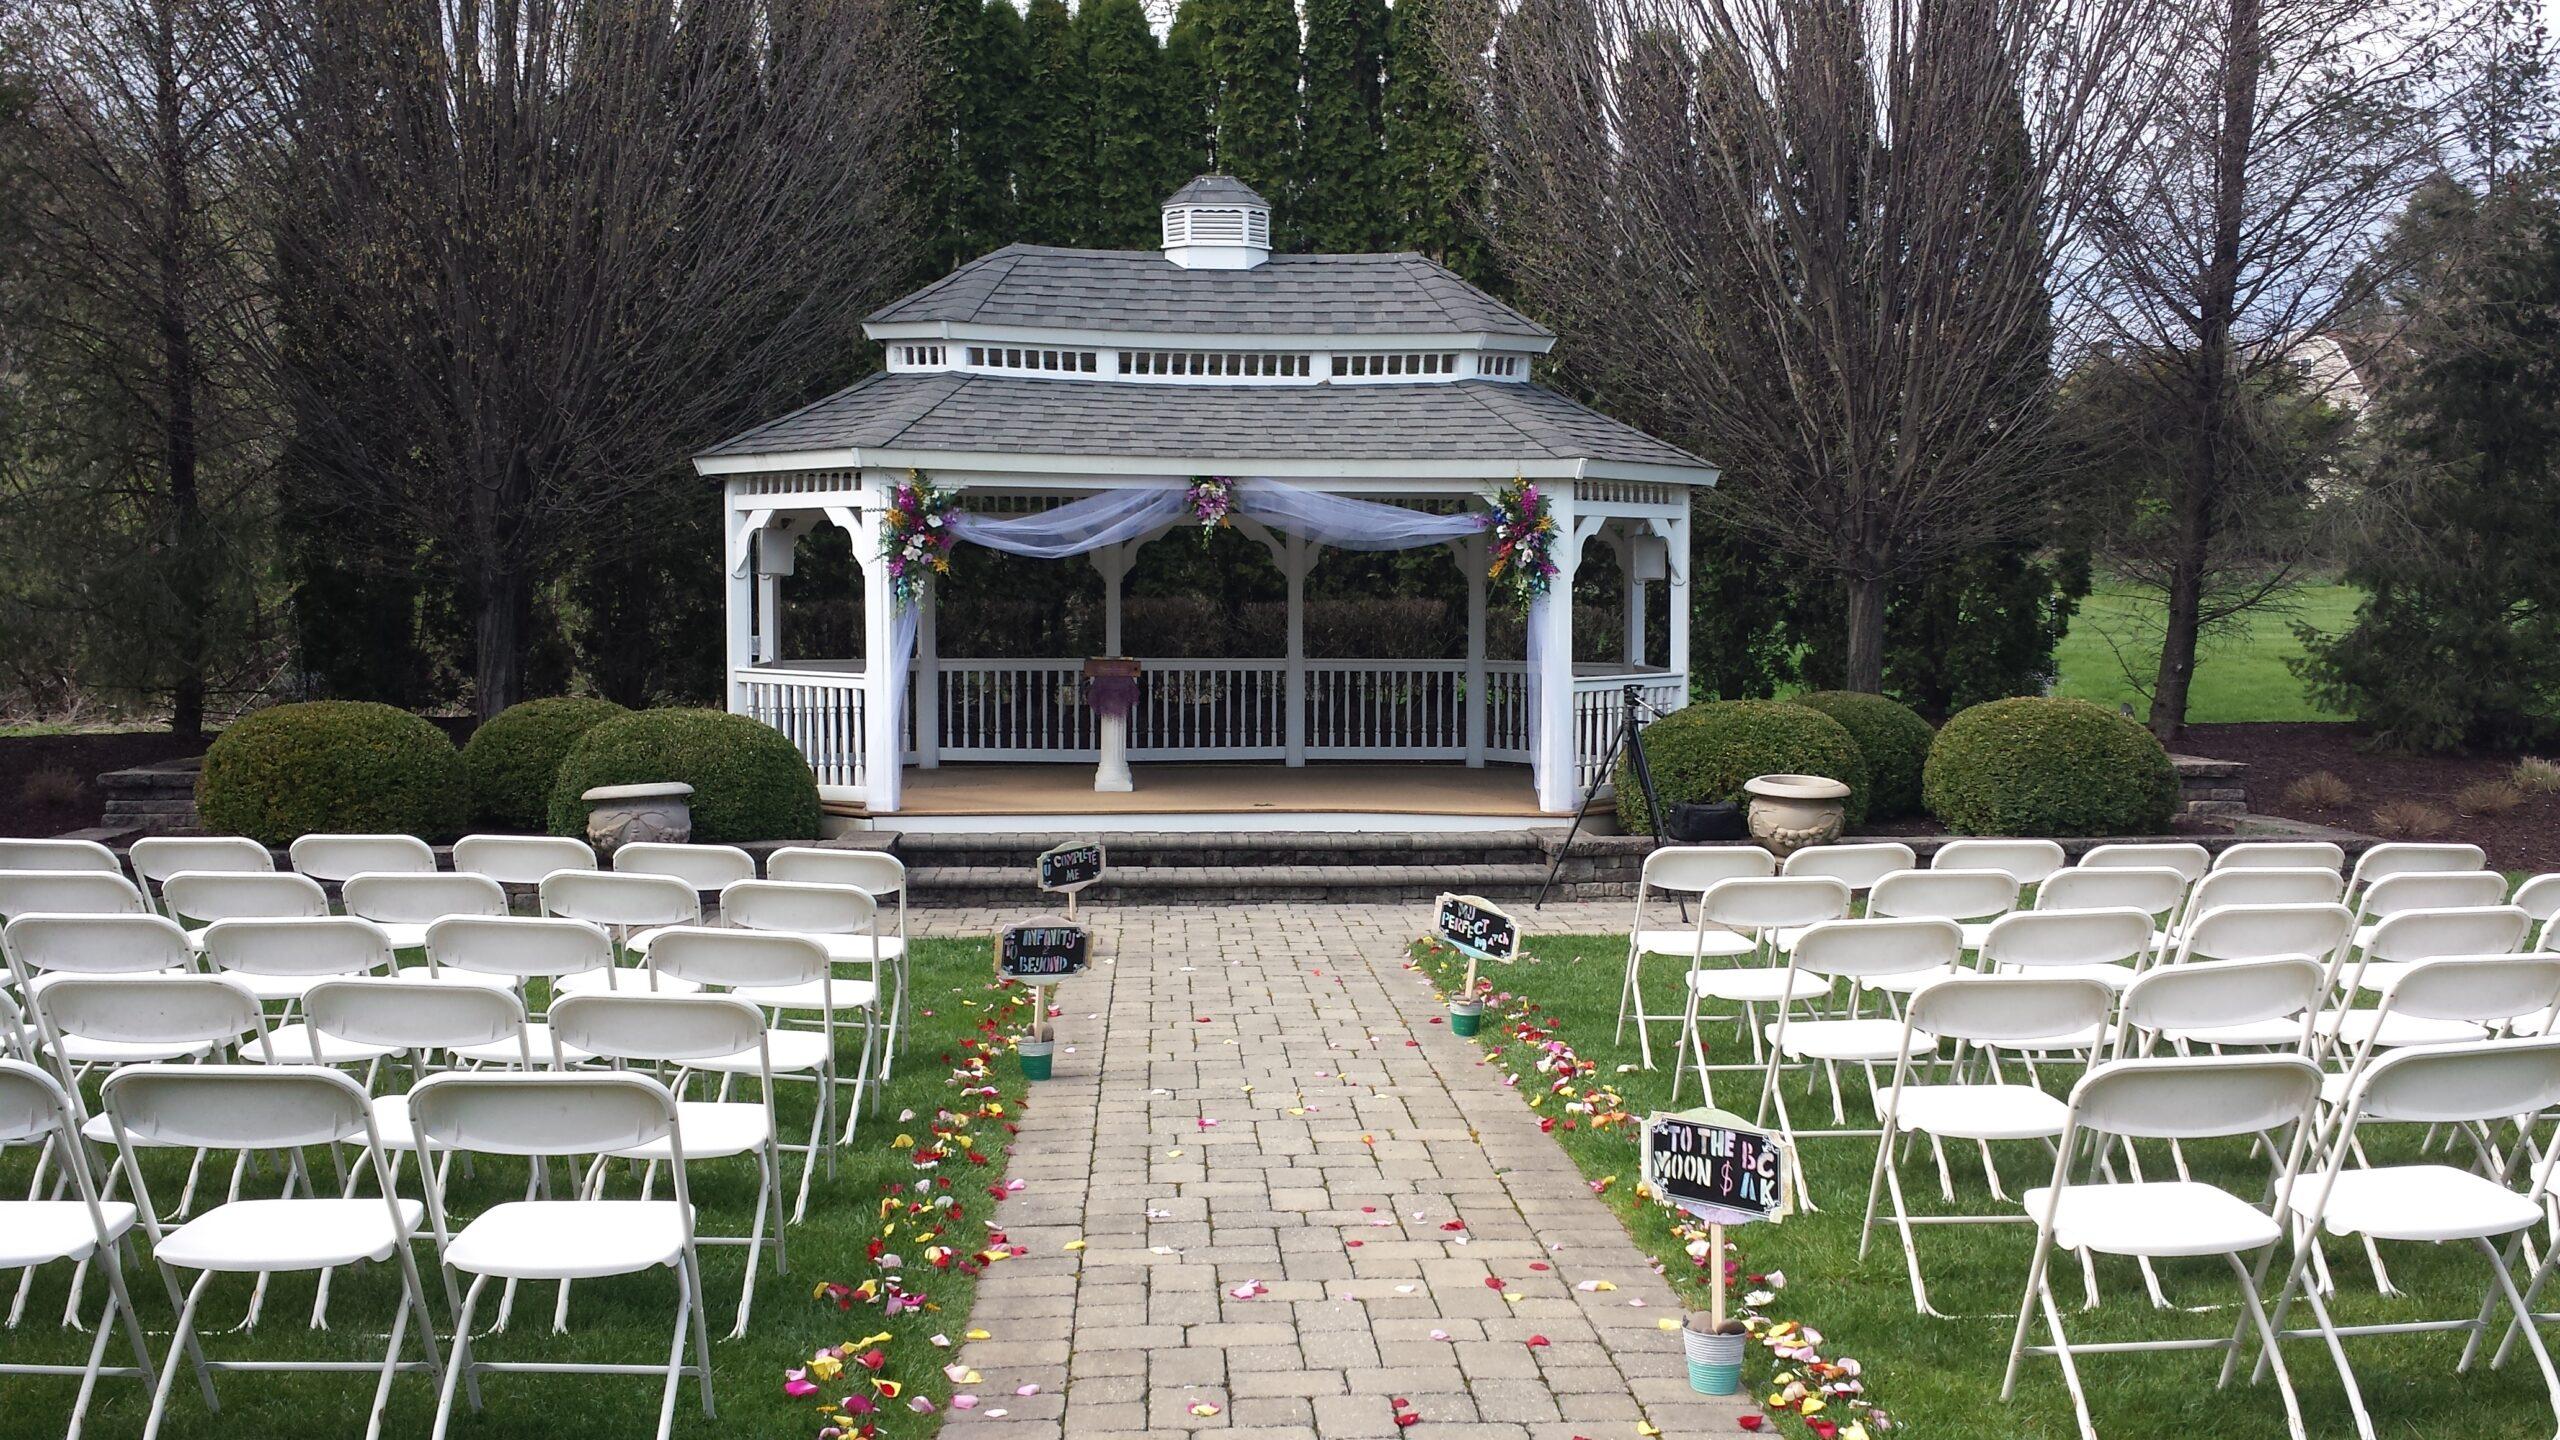 Andrea_Brock_Healing customized ceremony outdoor pavilion